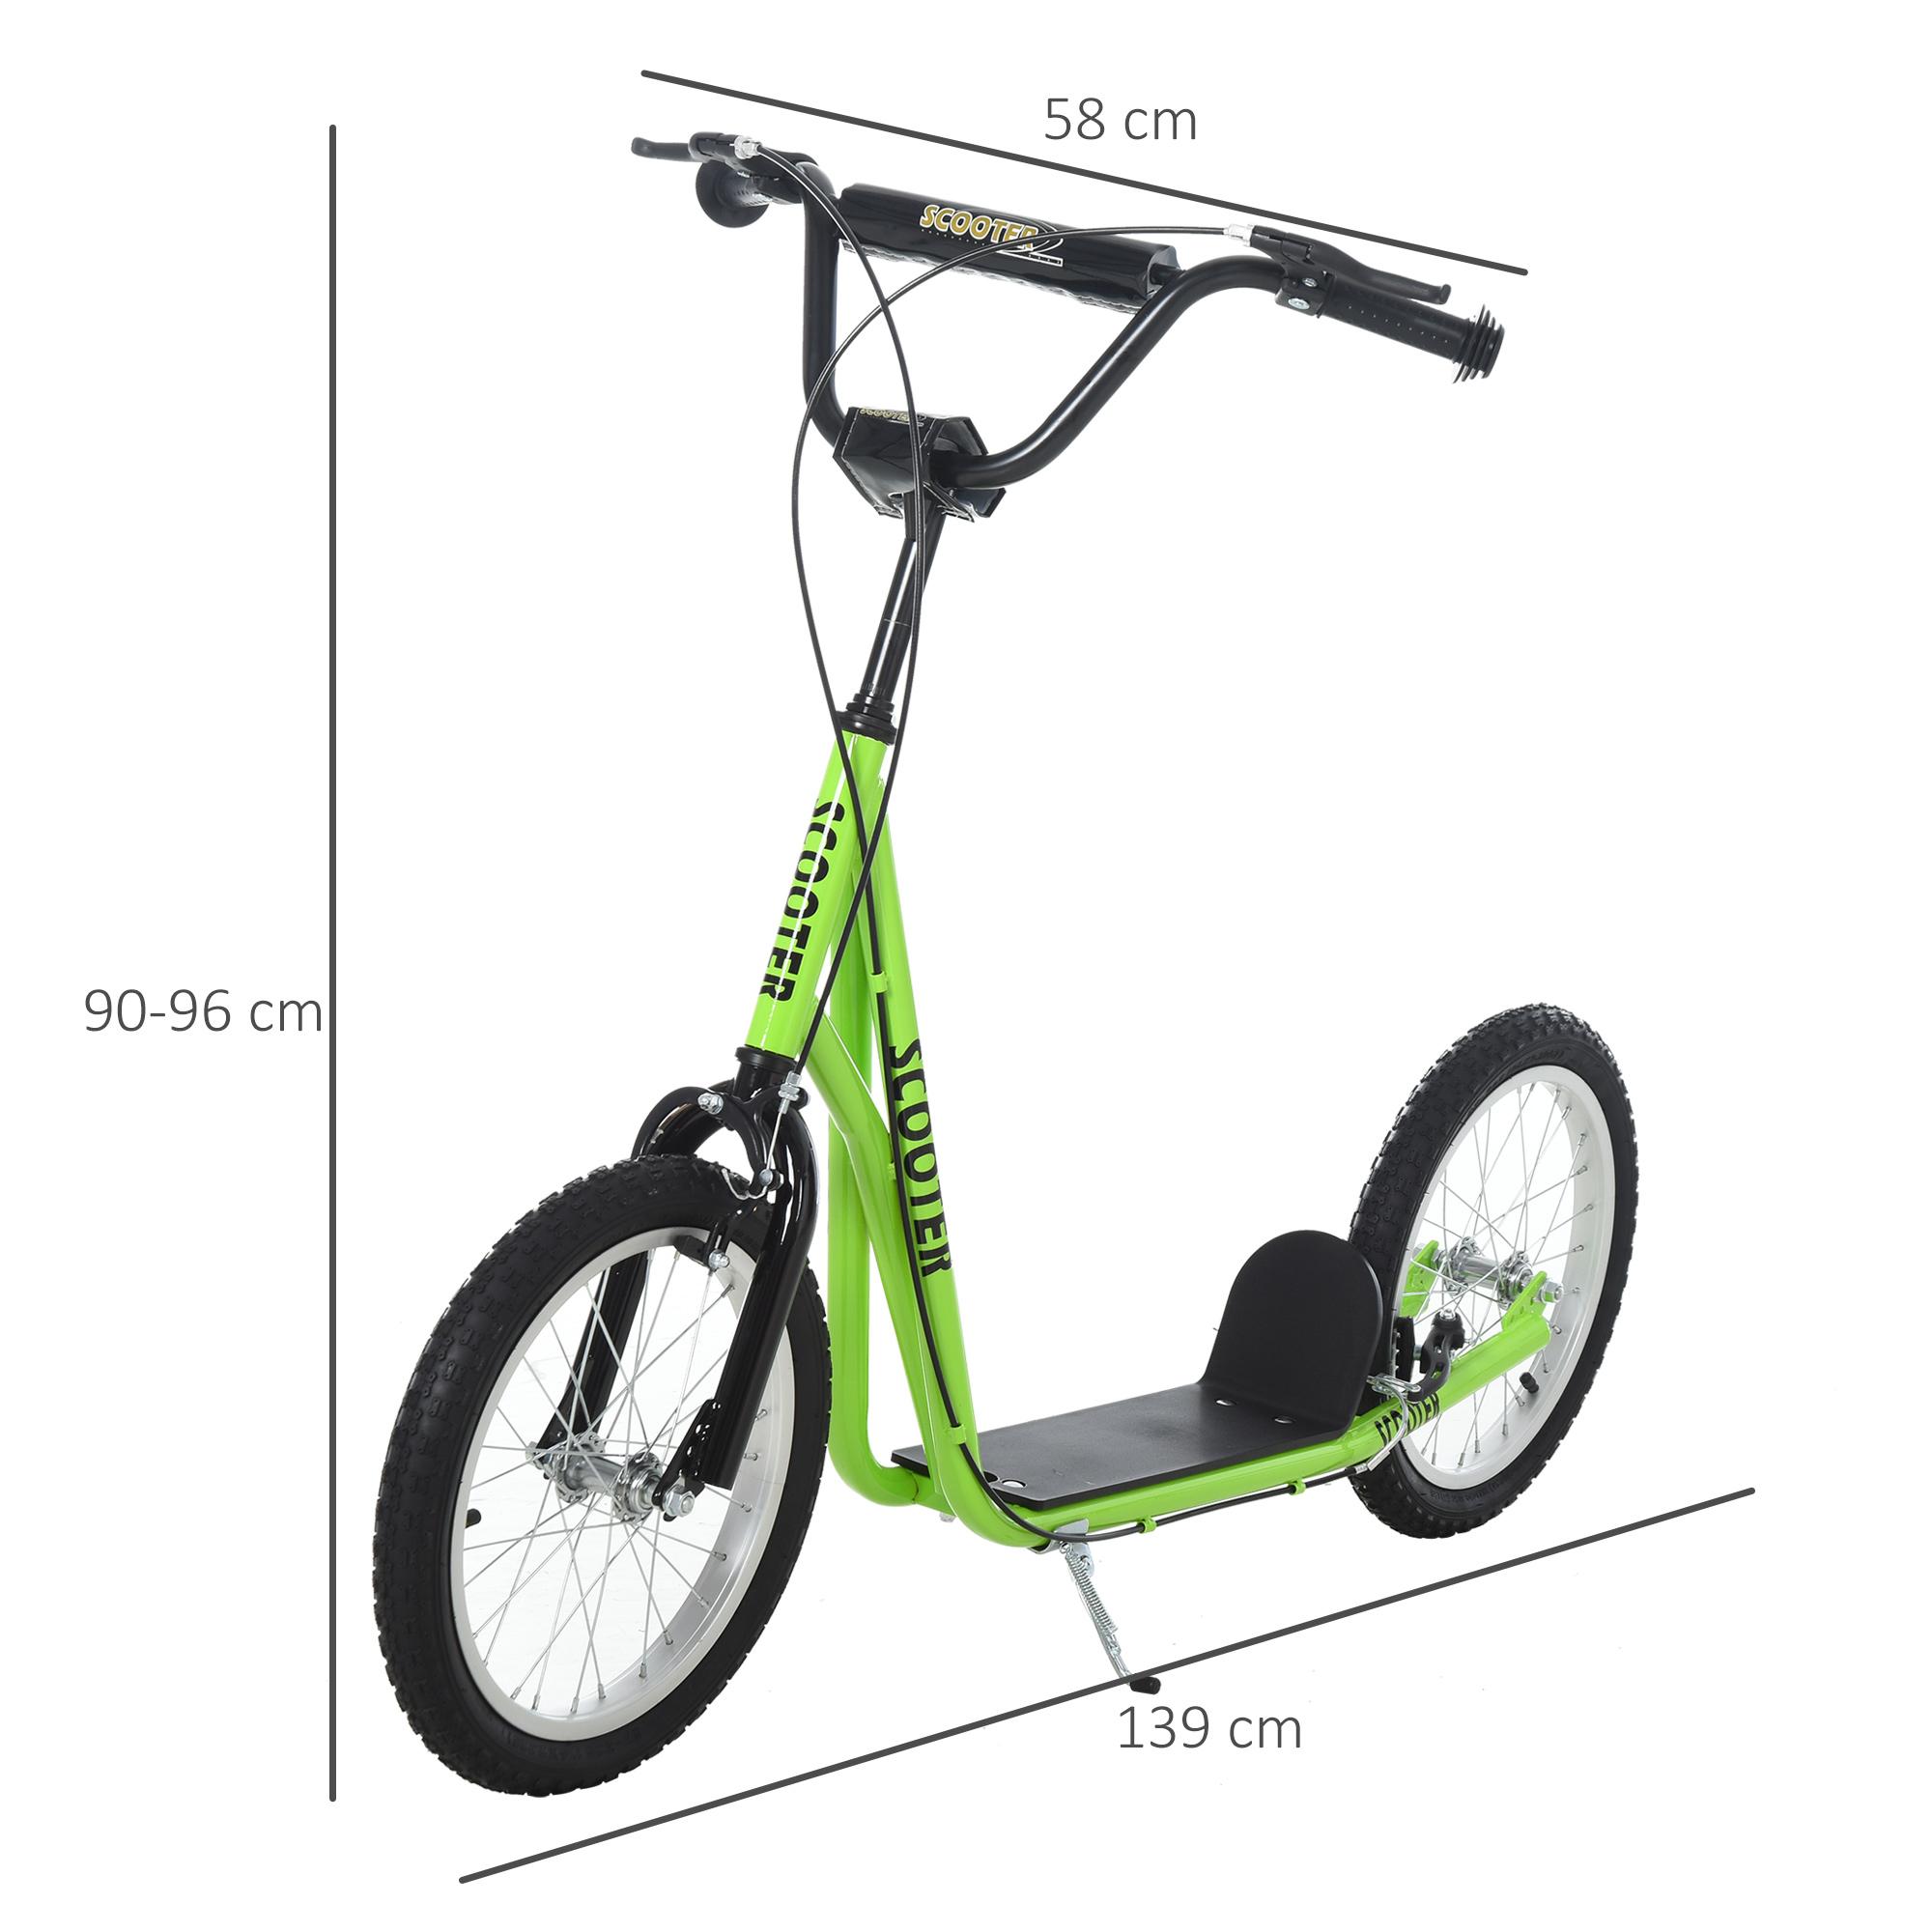 Indexbild 24 - HOMCOM-Tretroller-Kinderroller-Scooter-Cityroller-Roller-verstellbar-Blau-Gruen